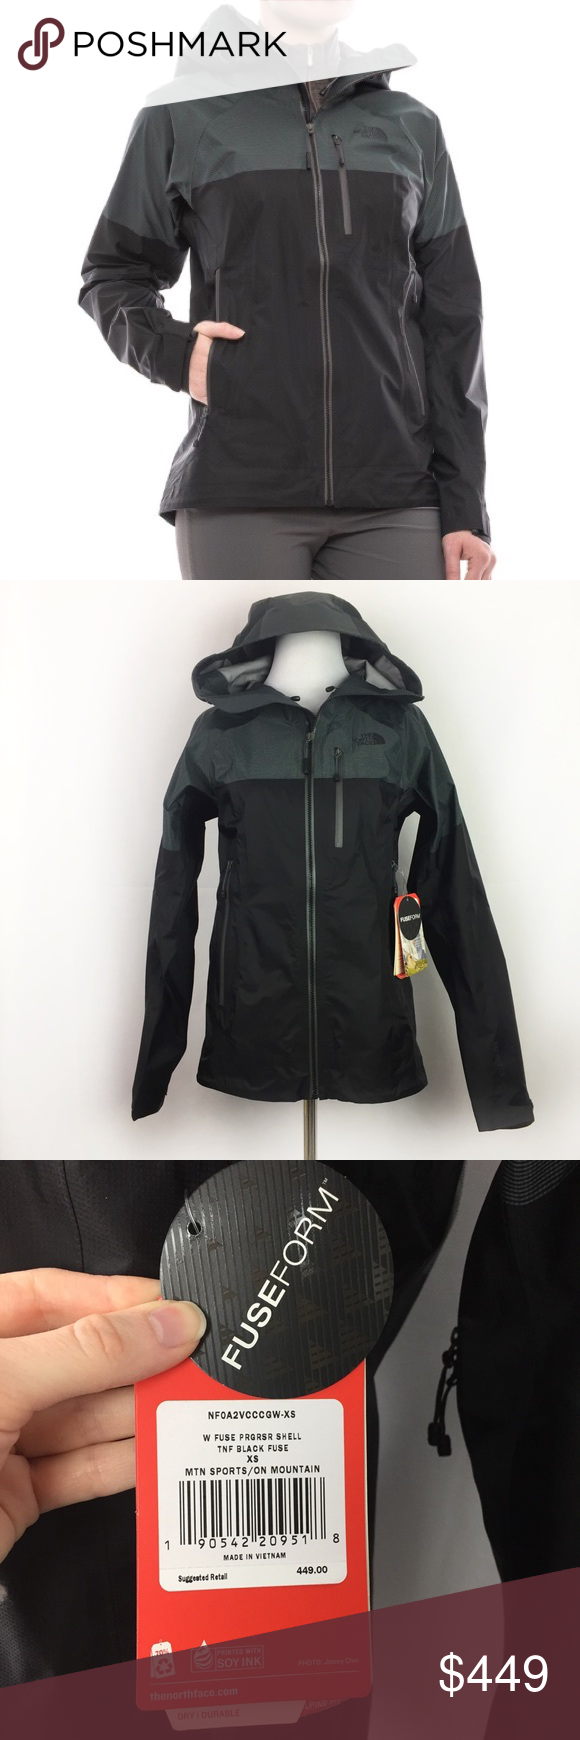 New The North Face Fuseform Progressor Goretex Shell Women/'s Jacket XS $449